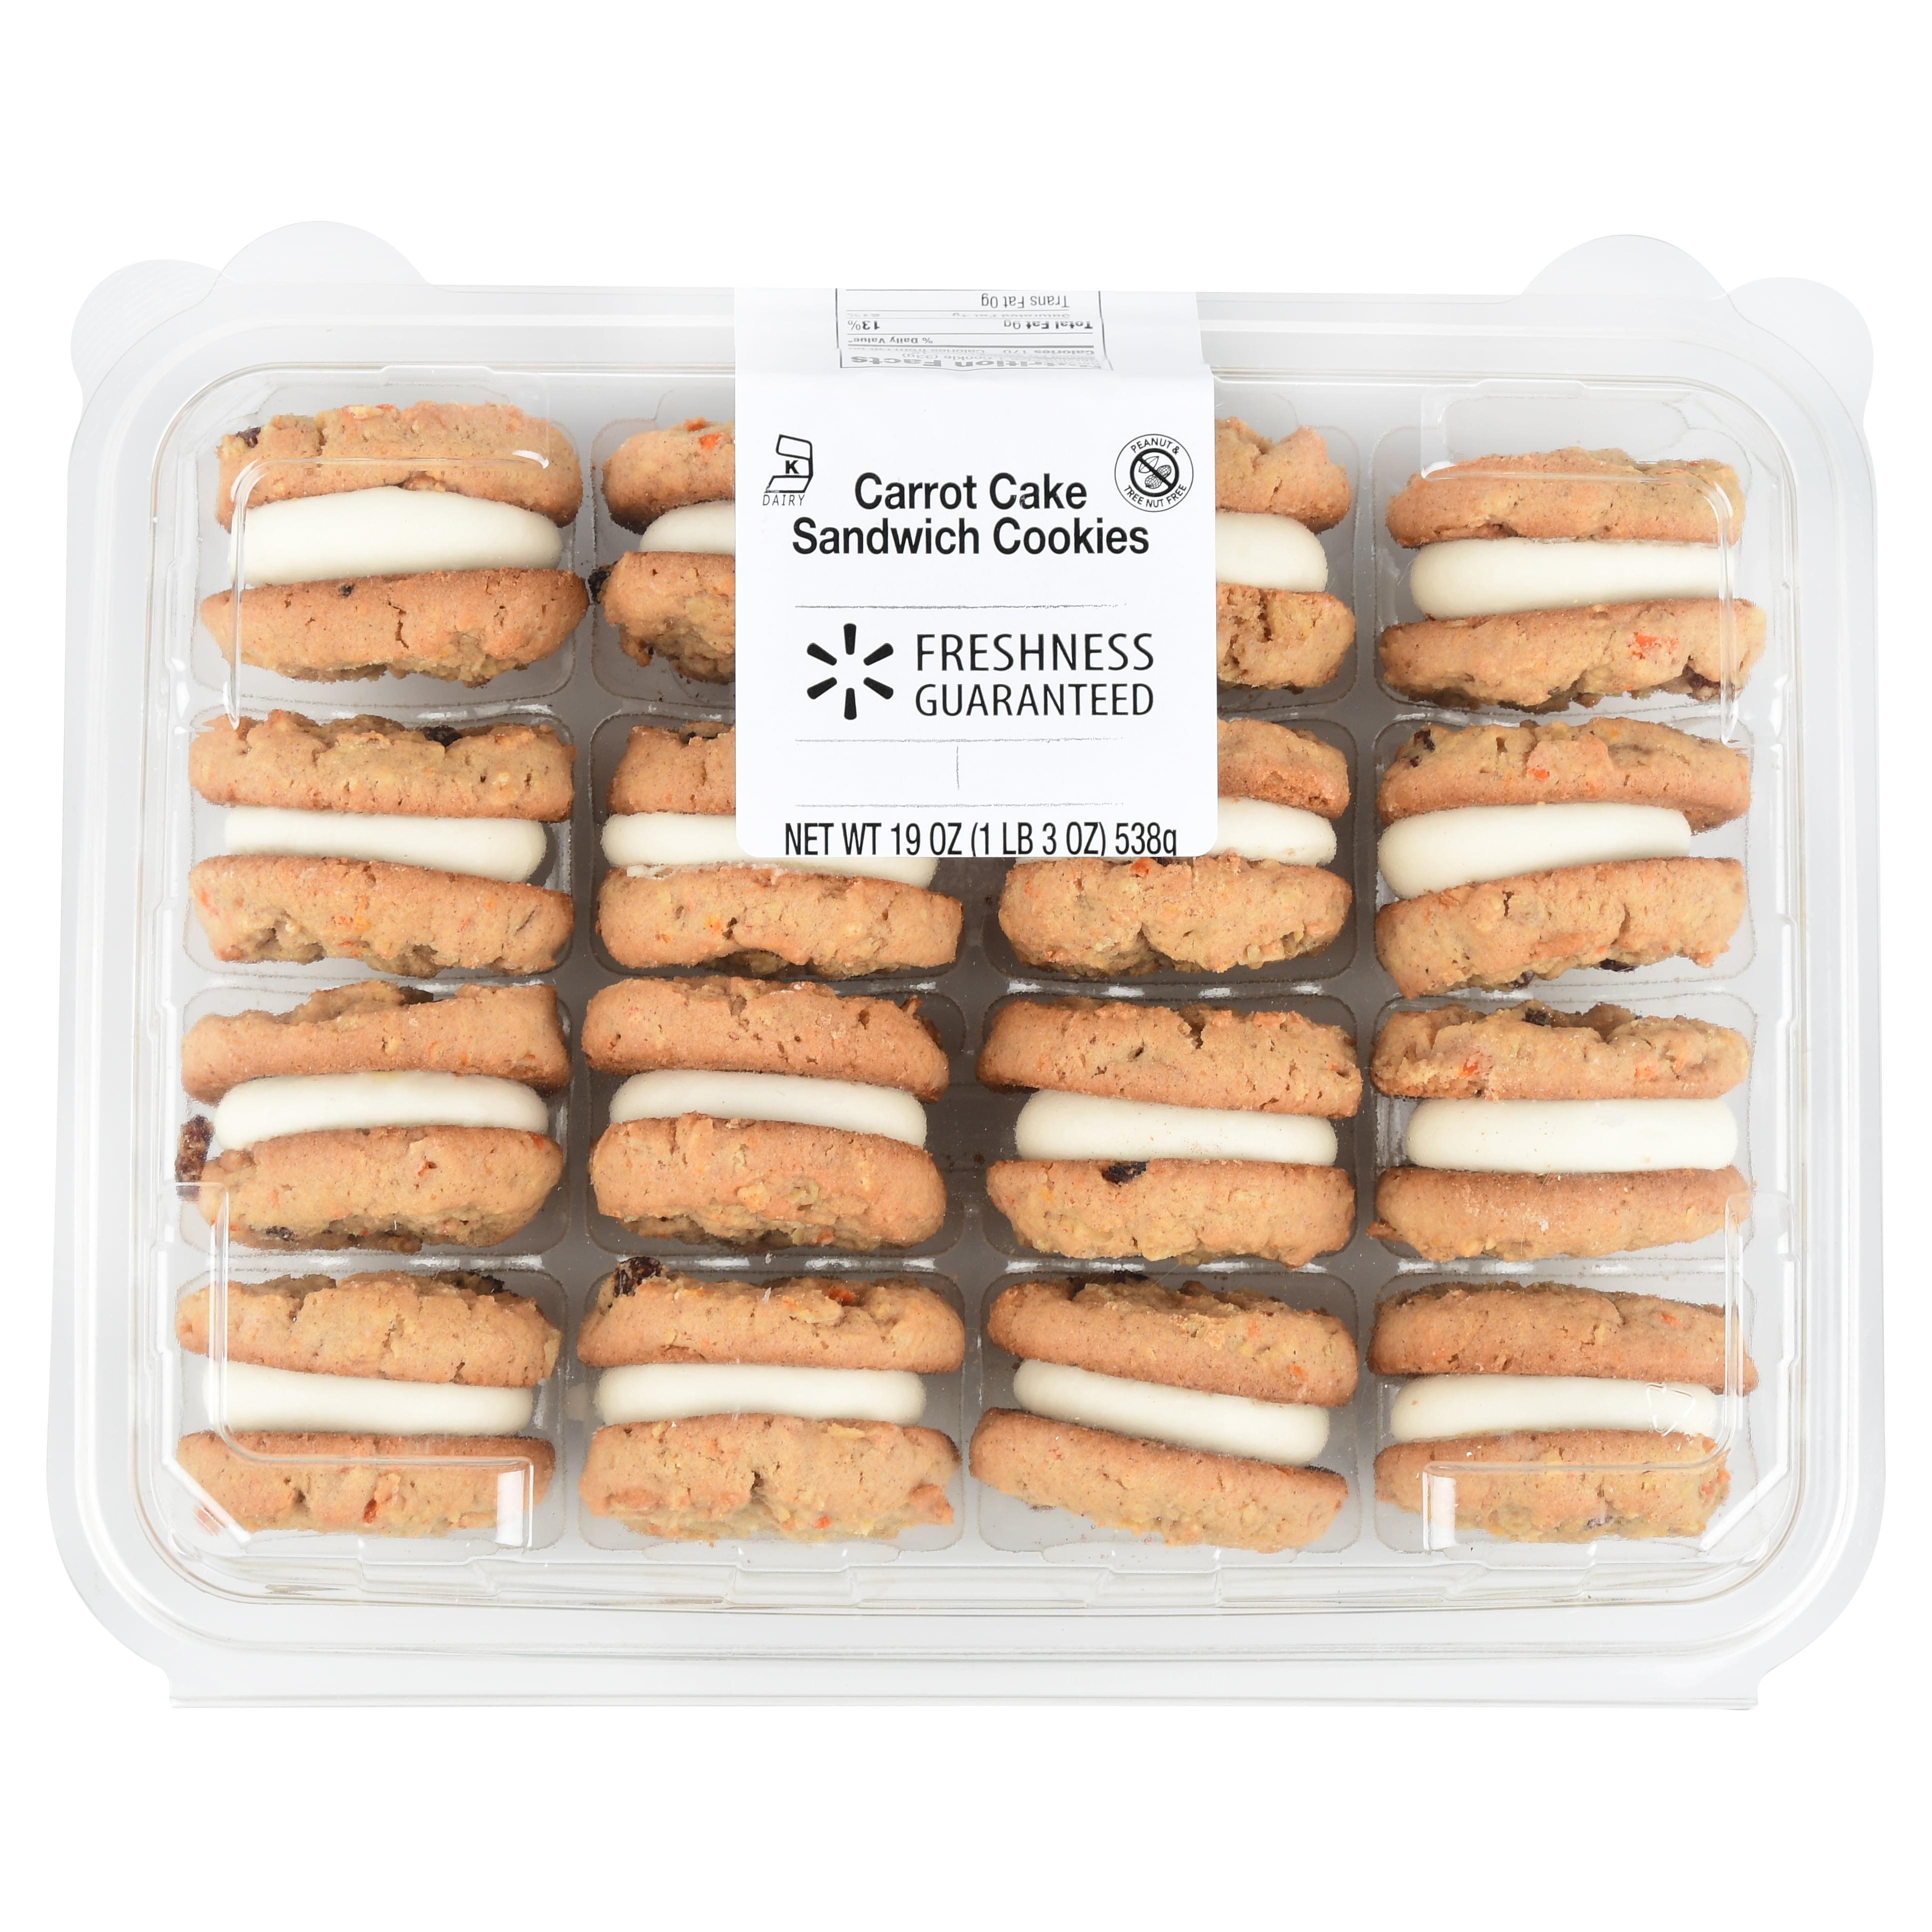 Freshness Guaranteed Carrot Cake Sandwich Cookies